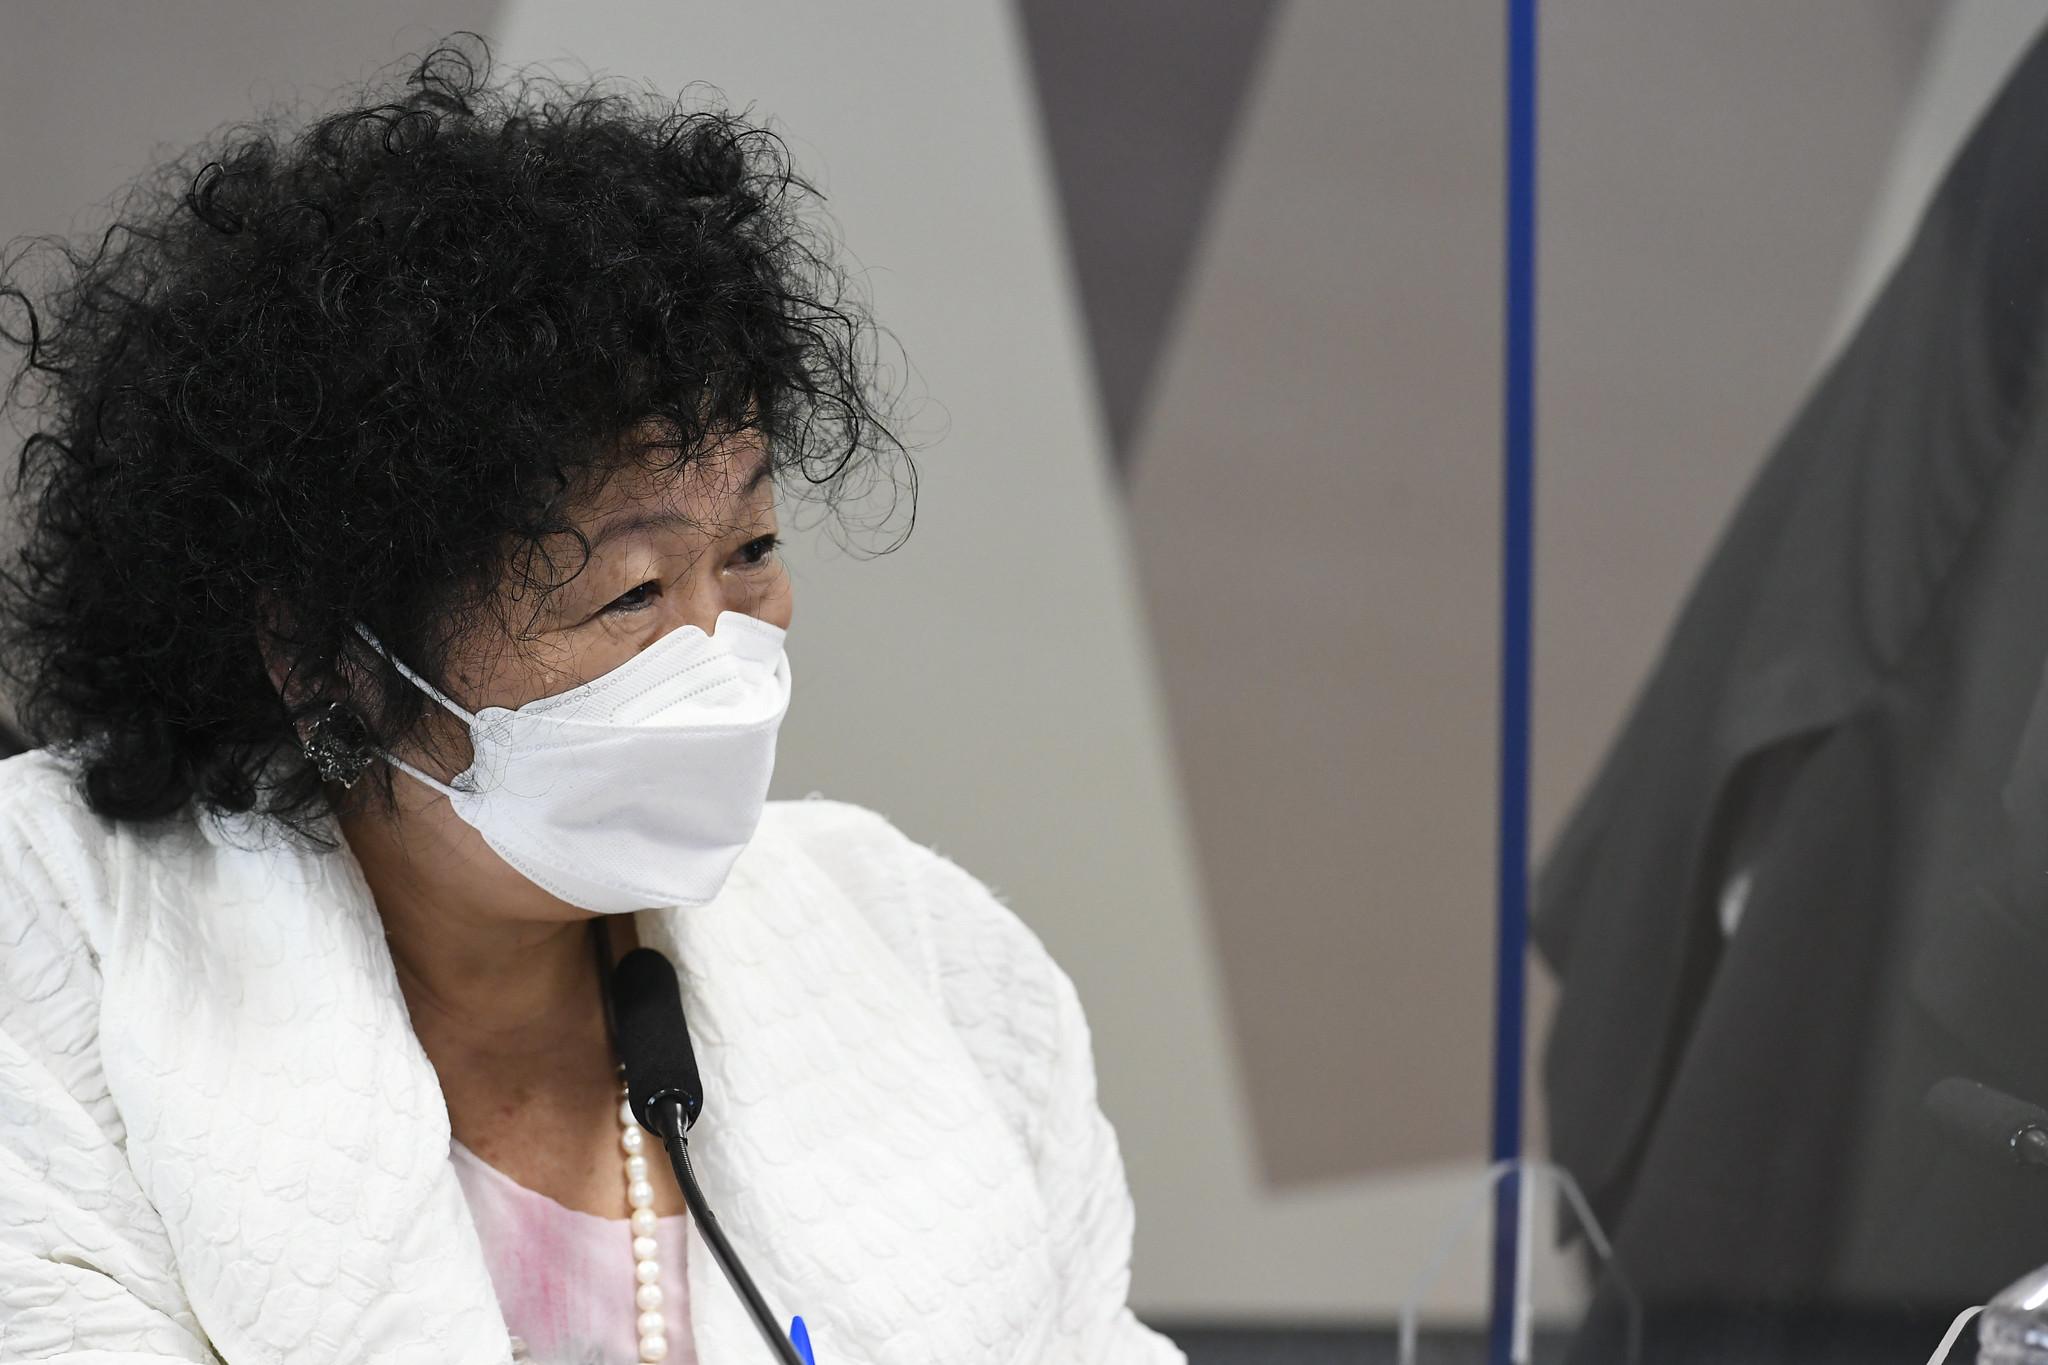 IMAGEM: Nise Yamaguchi diz ter sido humilhada na CPI da Covid